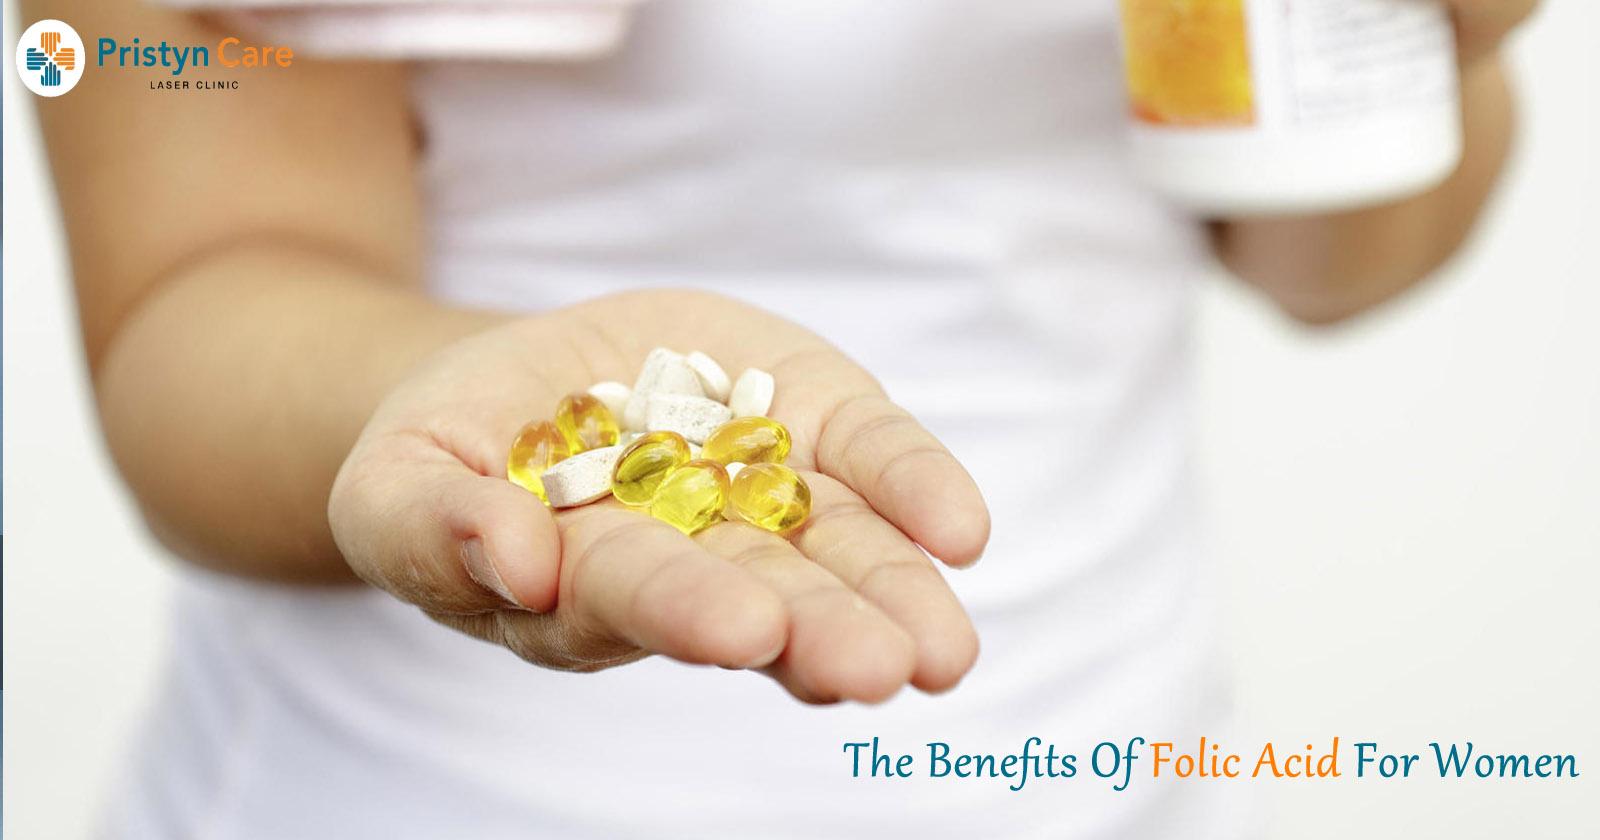 The benefits of folic acid for women